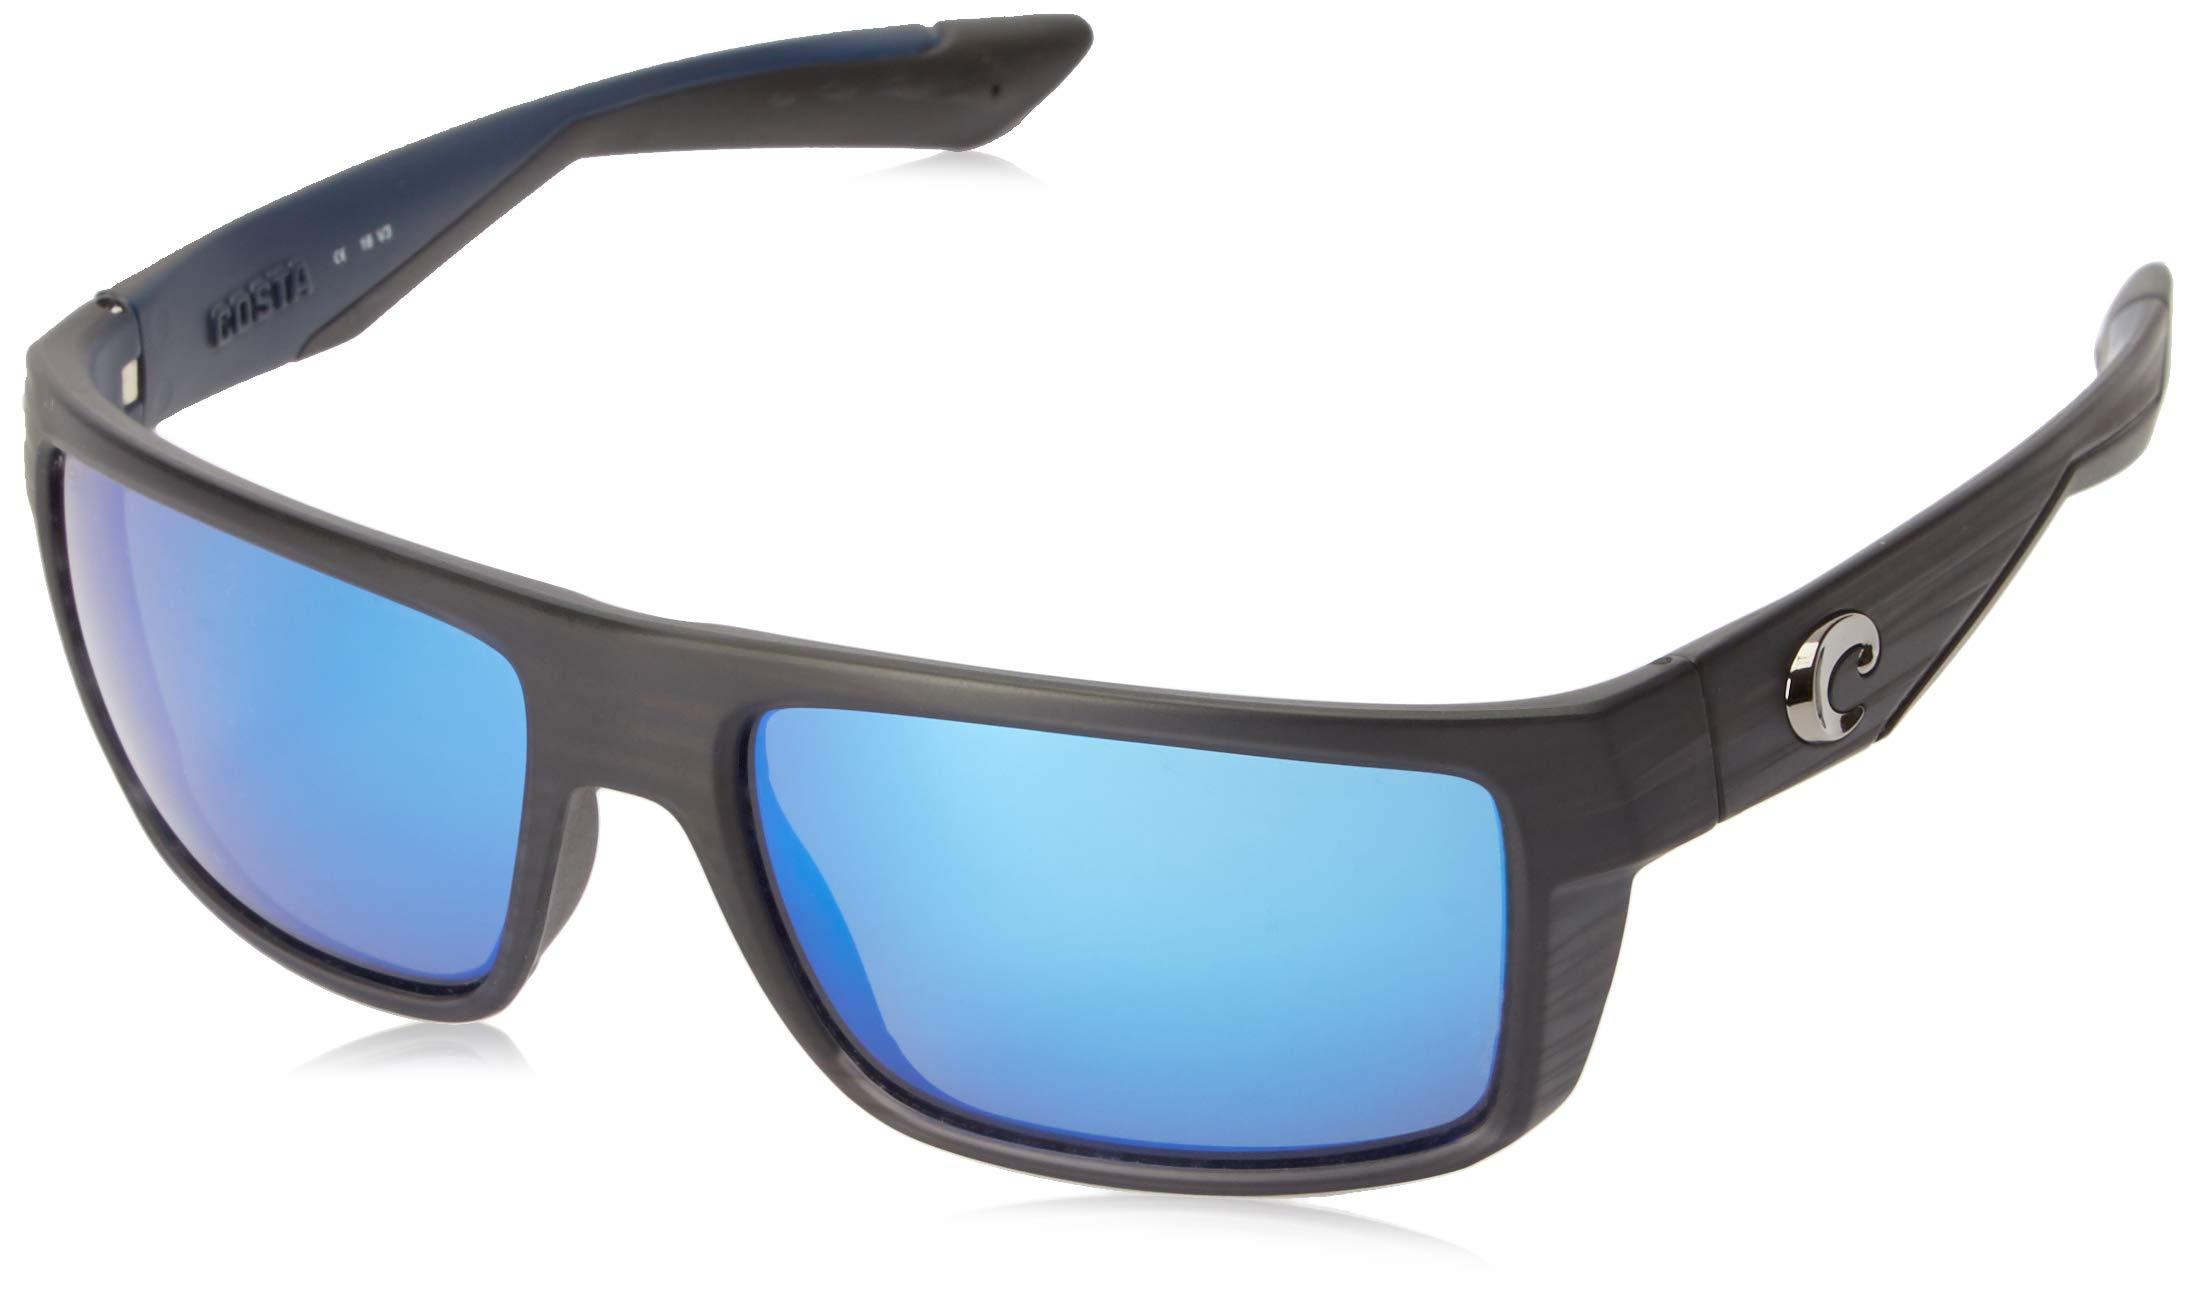 Costa Del Mar Motu Sunglasses, Black Teak, Blue Mirror 580 Glass Lens by Costa Del Mar